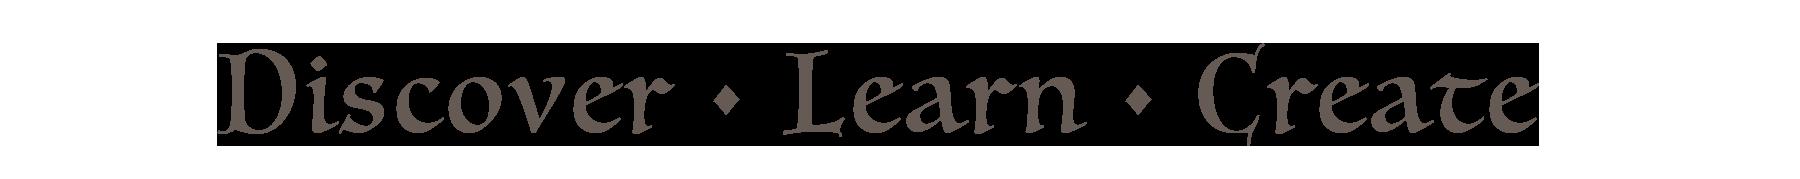 Discover, Learn & Create at Legacies III